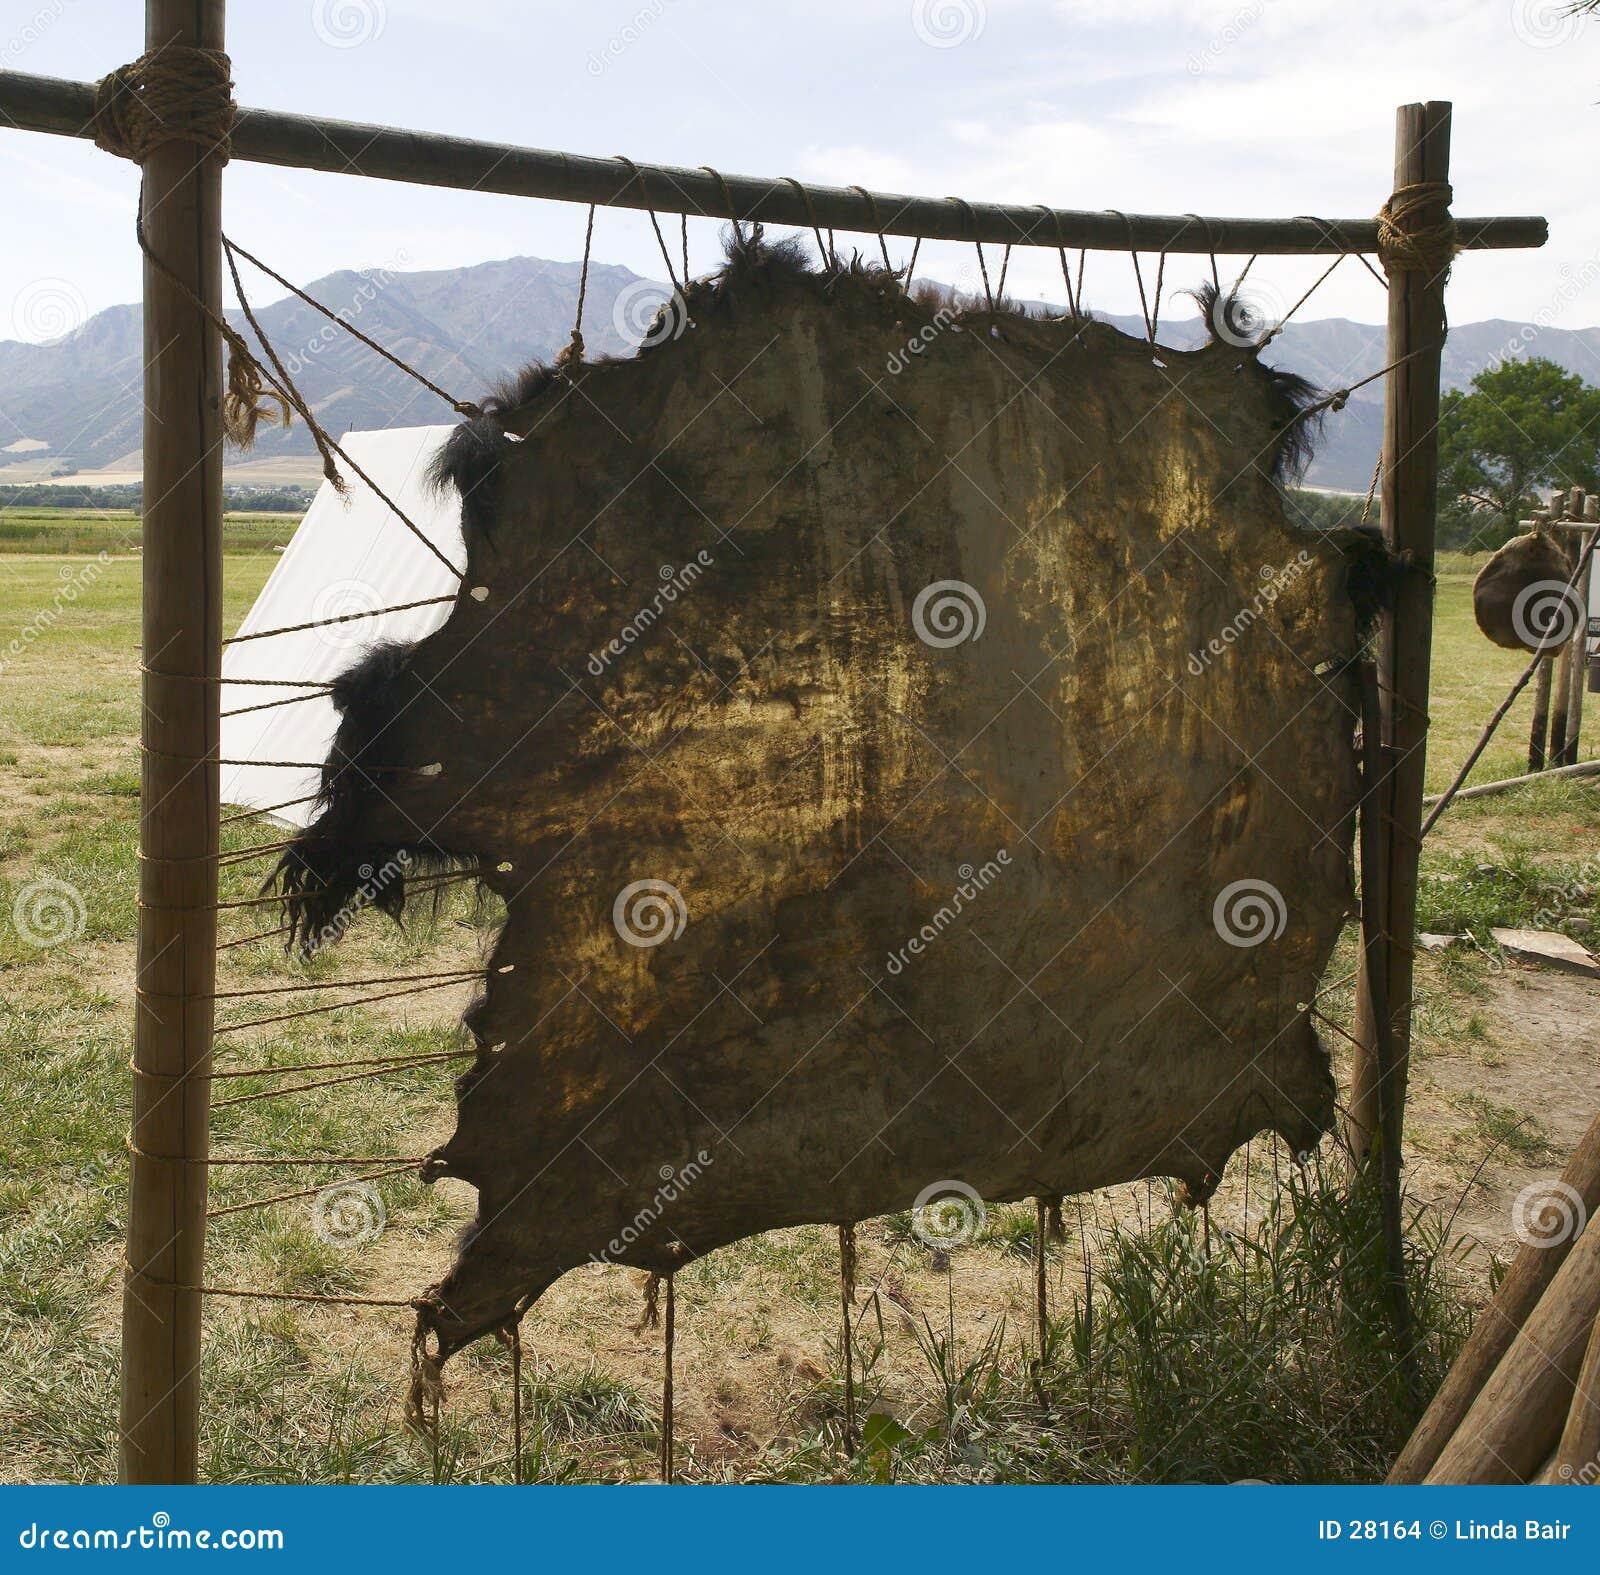 Peau de Buffalo